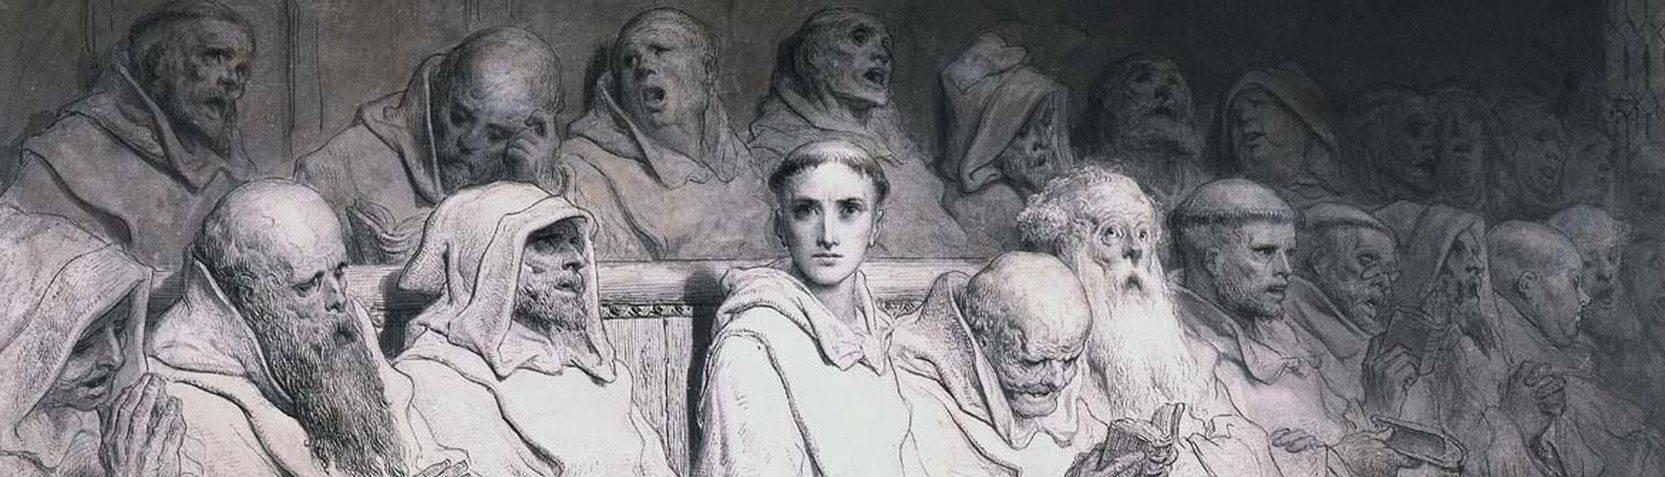 Artistes - Gustave Doré